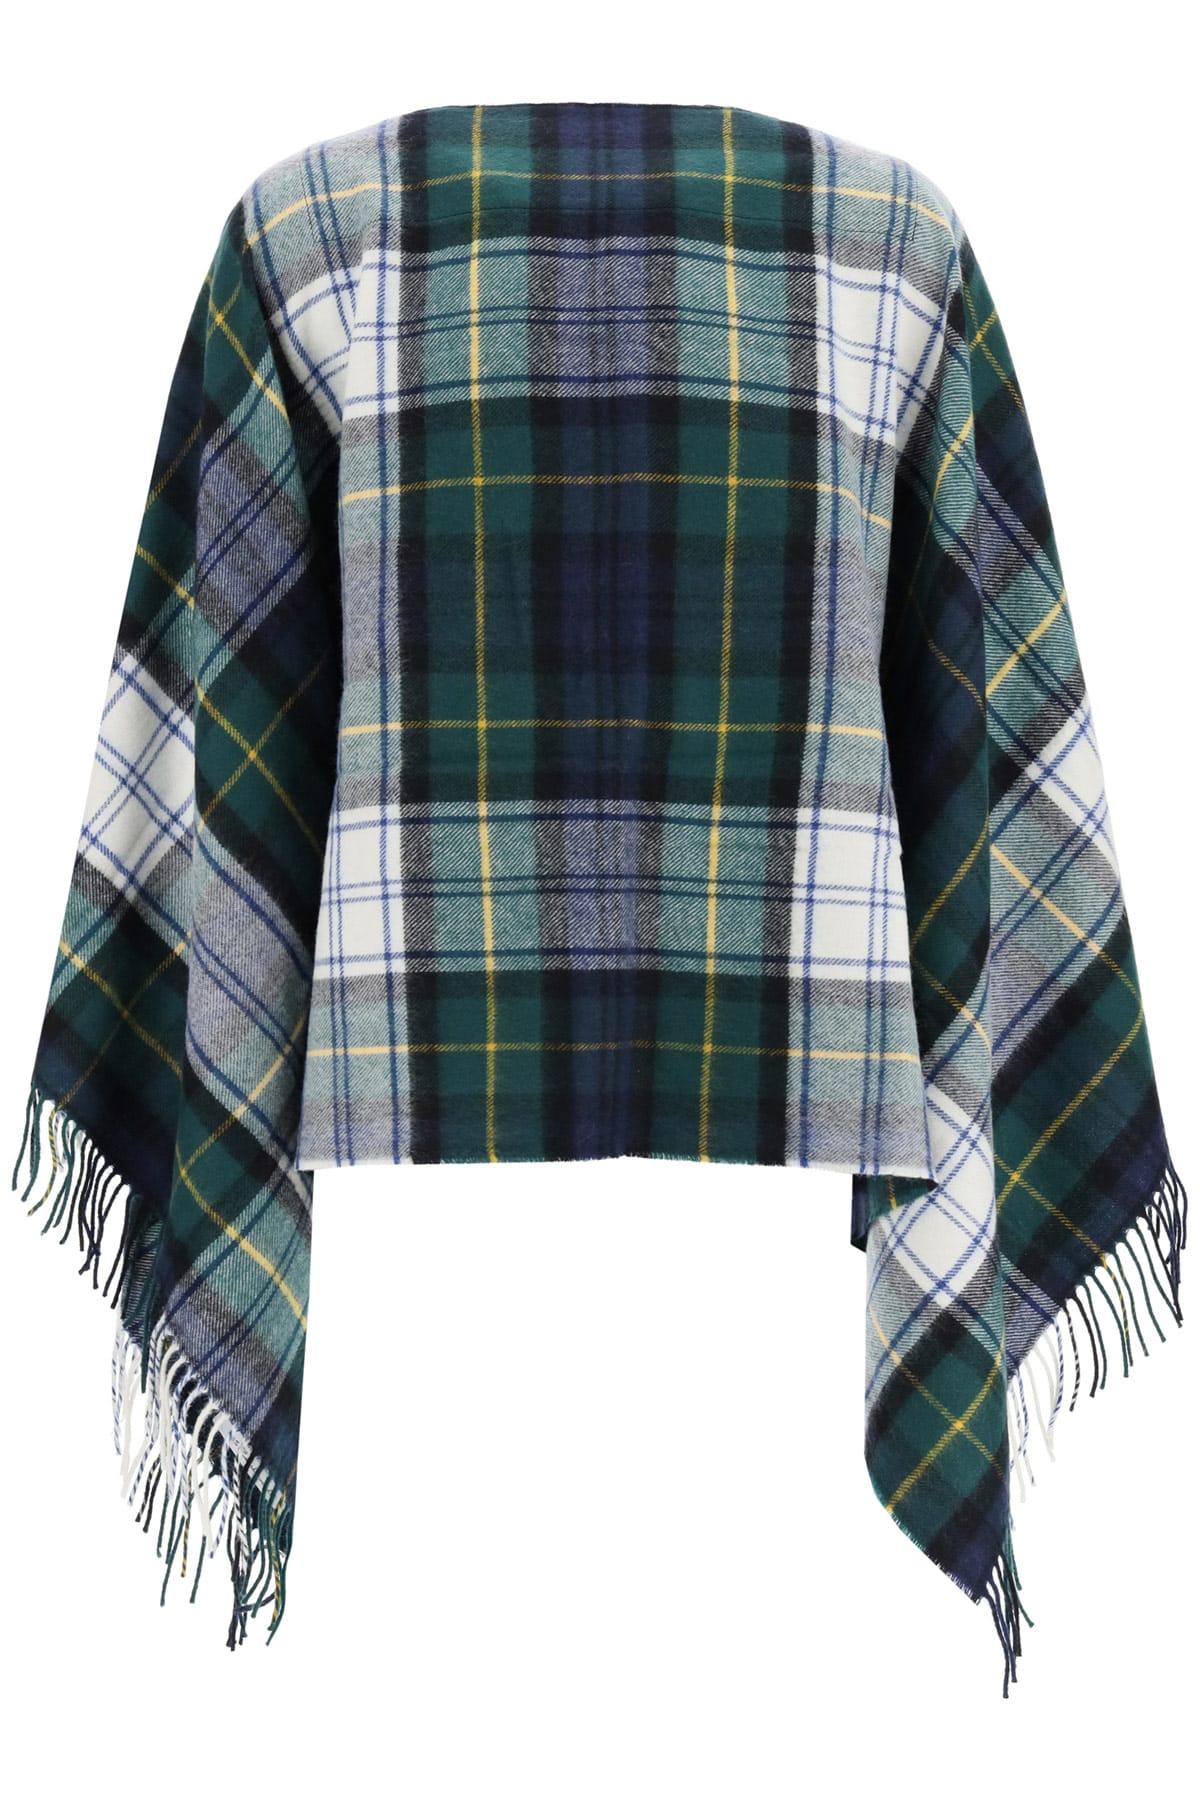 Comme Des Garçons Shirt Scarves TARTAN PONCHO SCARF